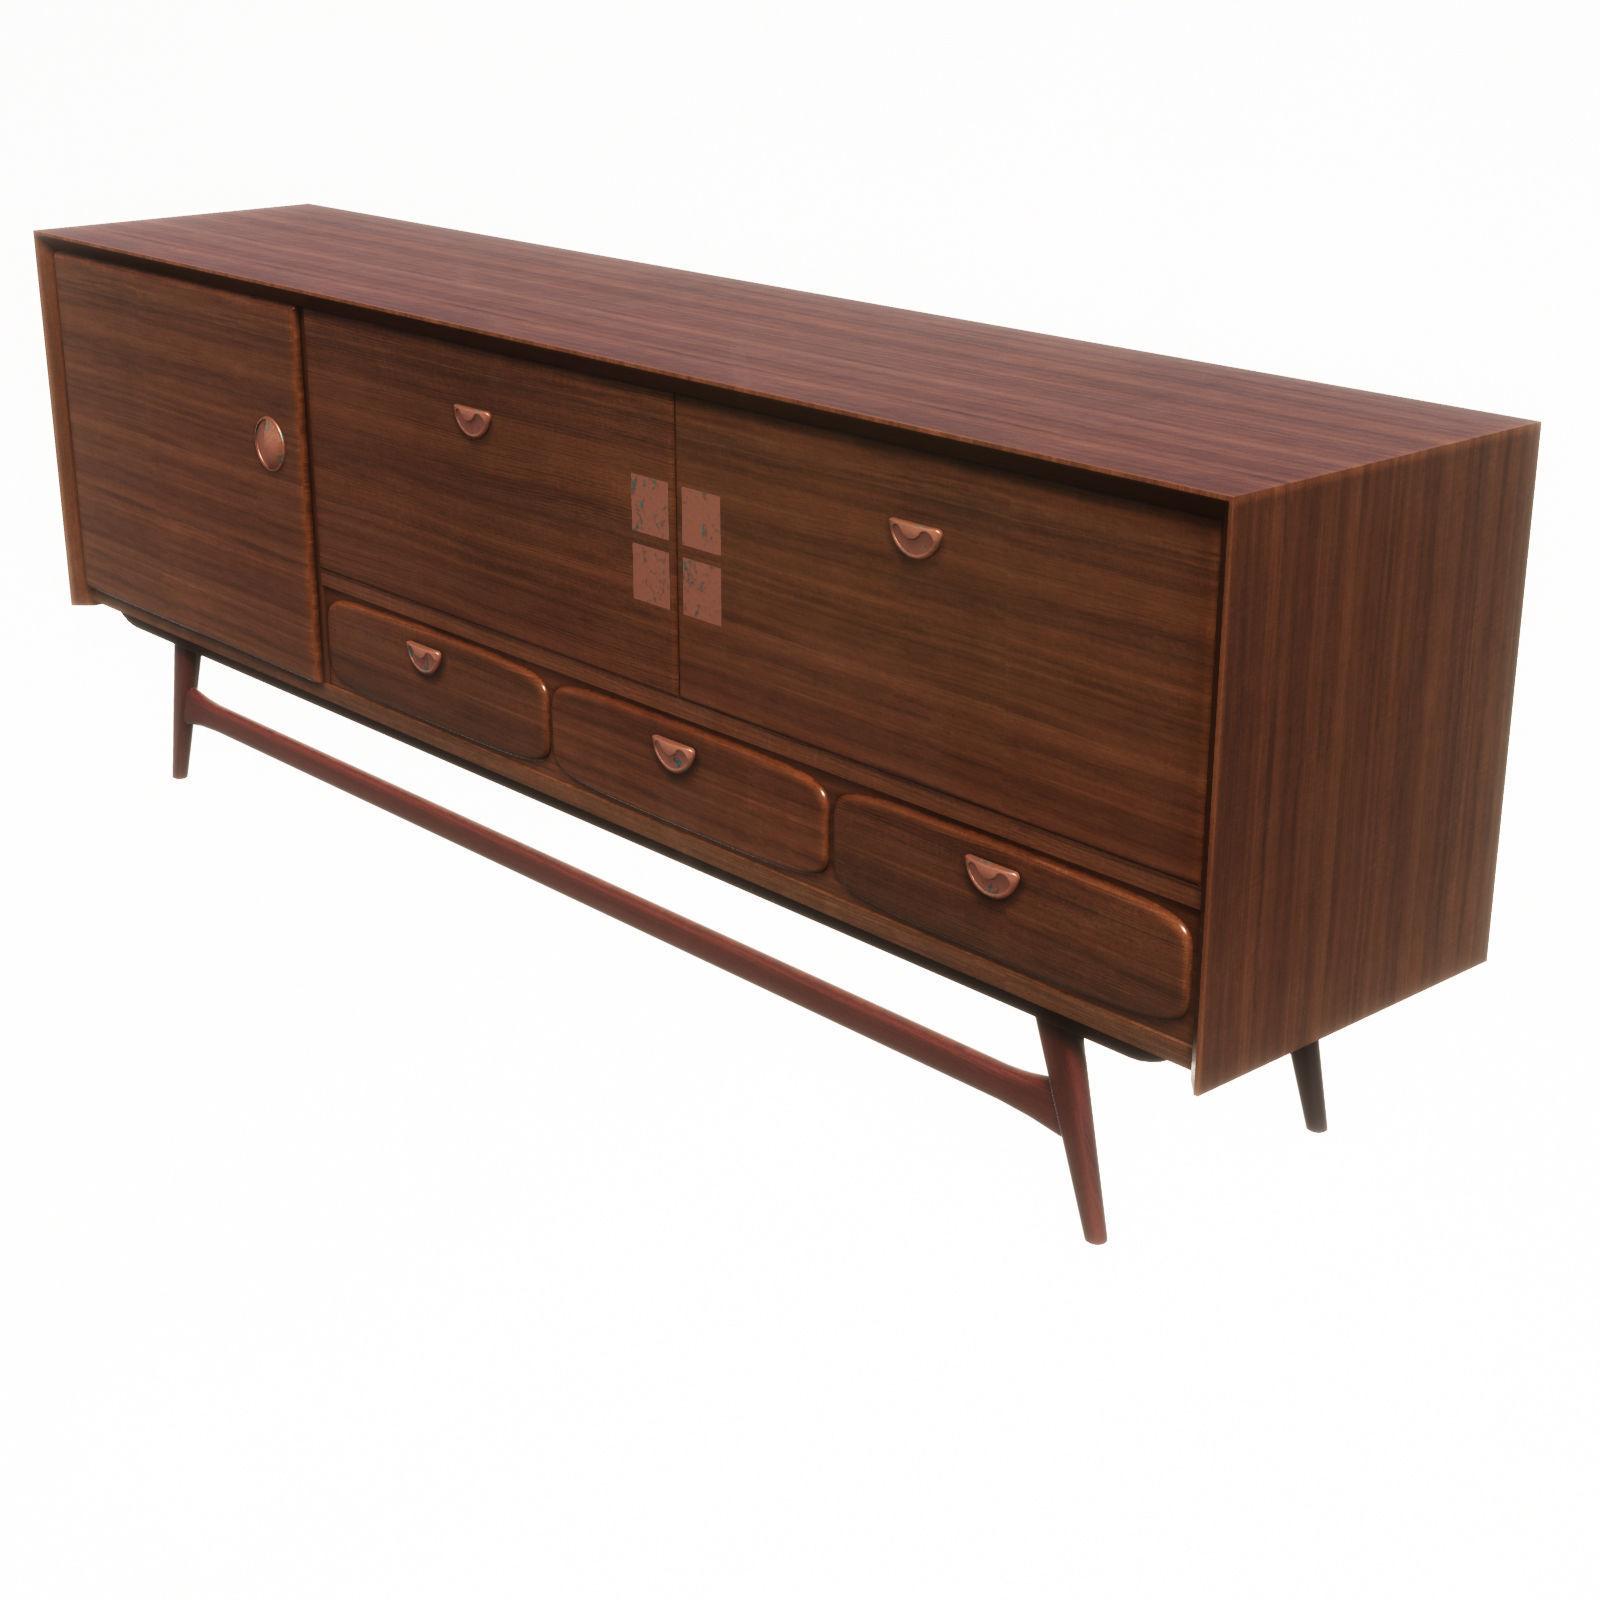 50s Dresser